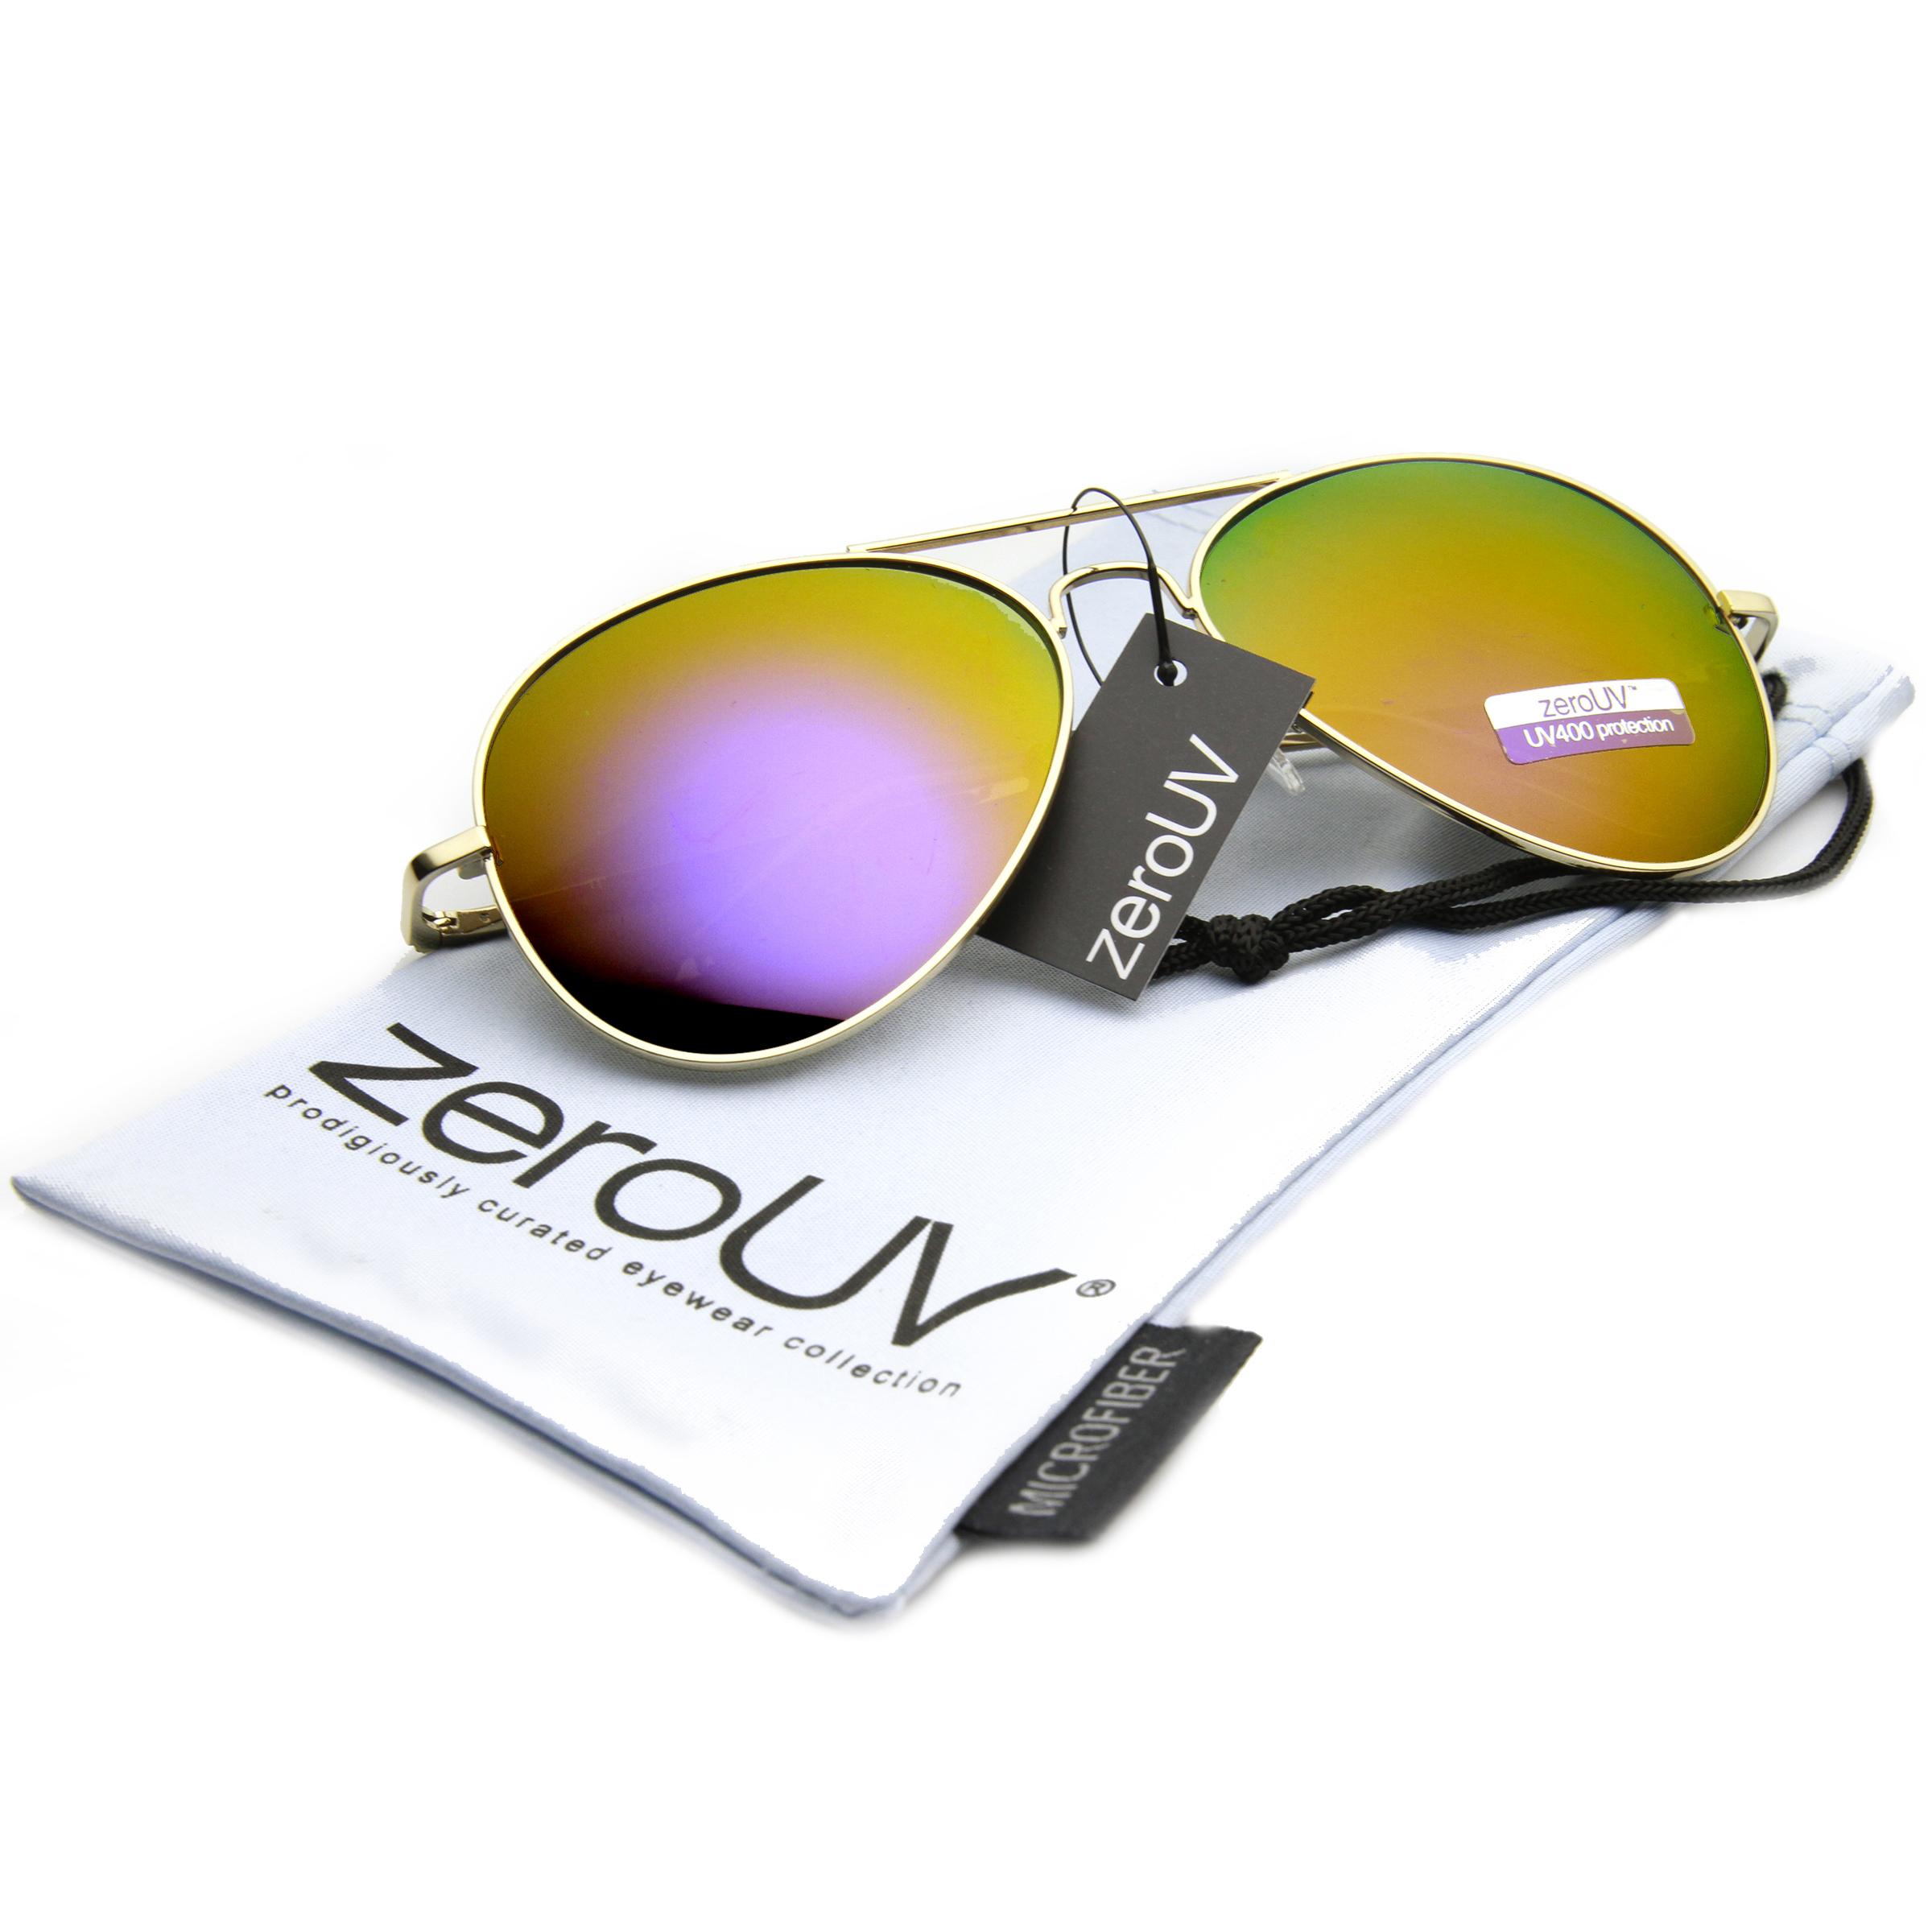 Premium-Full-Mirrored-Aviator-Sunglasses-w-Flash-Mirror-Lens